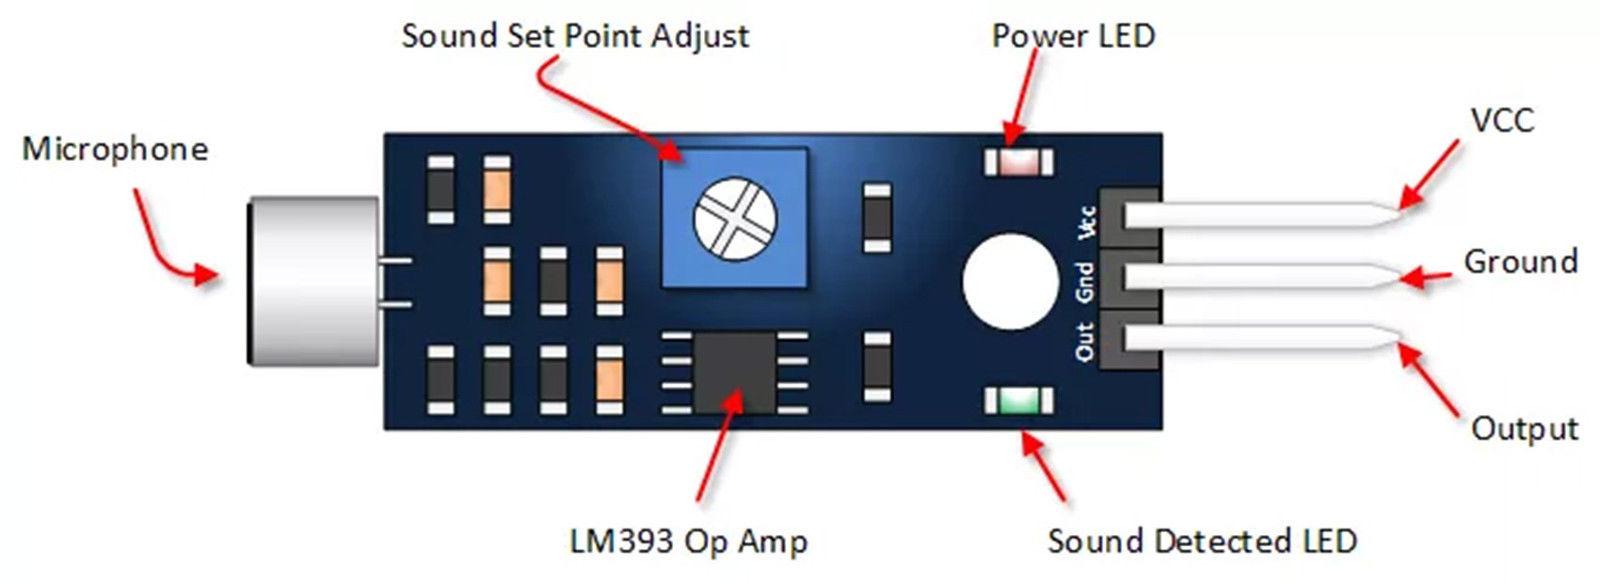 Electret Condenser Sound Detection Module All Top Notch Power The Mic Through Arduino Uno As Shown In Circuit Diagram